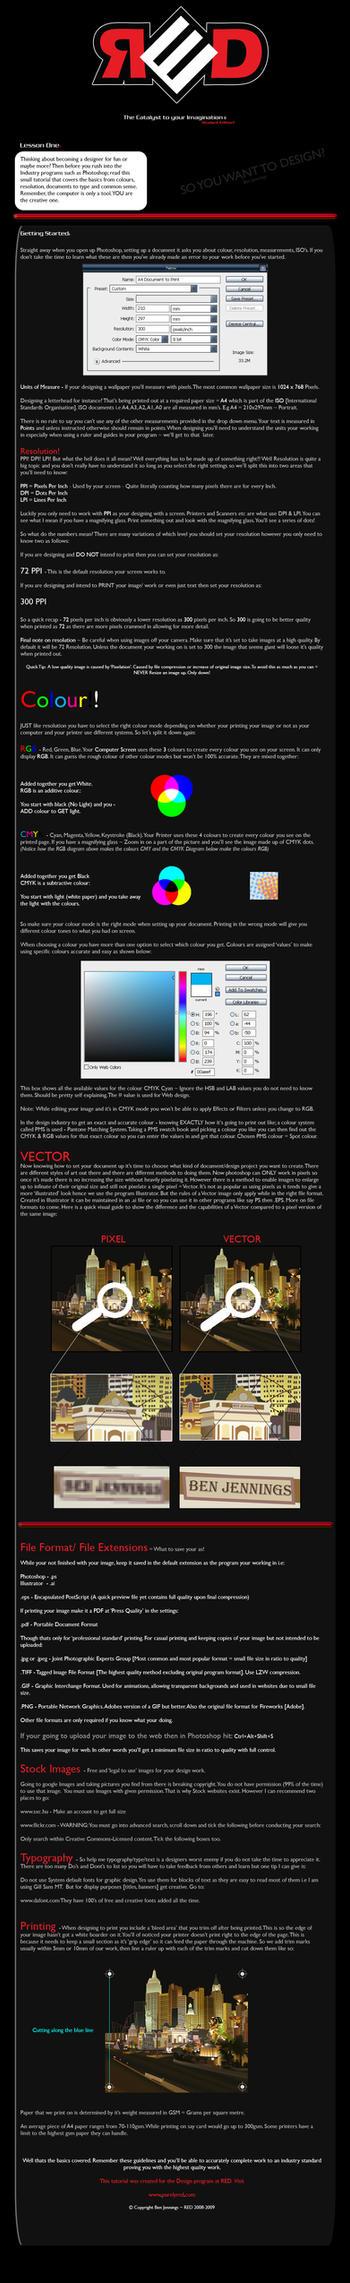 Learn Graphic Design - Basics by DarK0rder